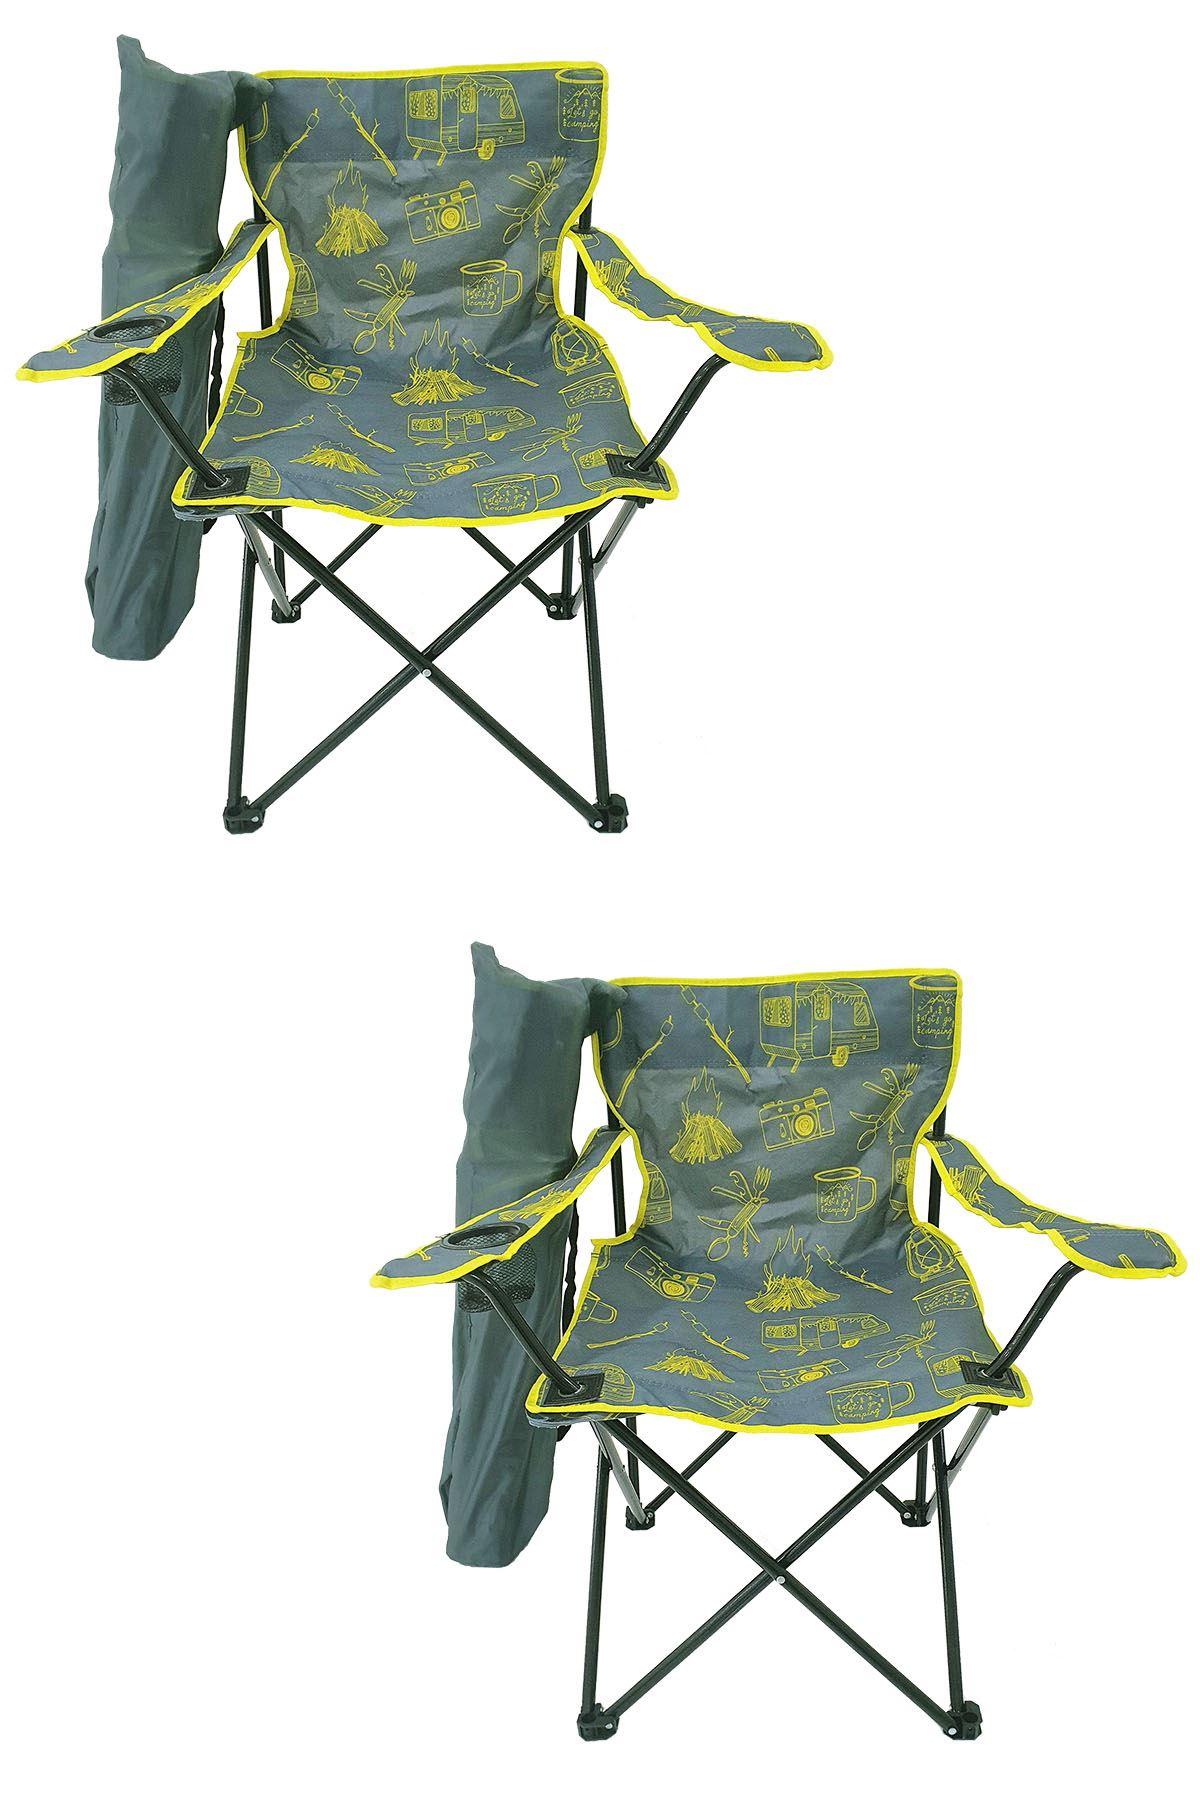 Bofigo 2 Pieces Camping Chair Folding Chair Garden Chair Picnic Beach Chair Patterned Gray